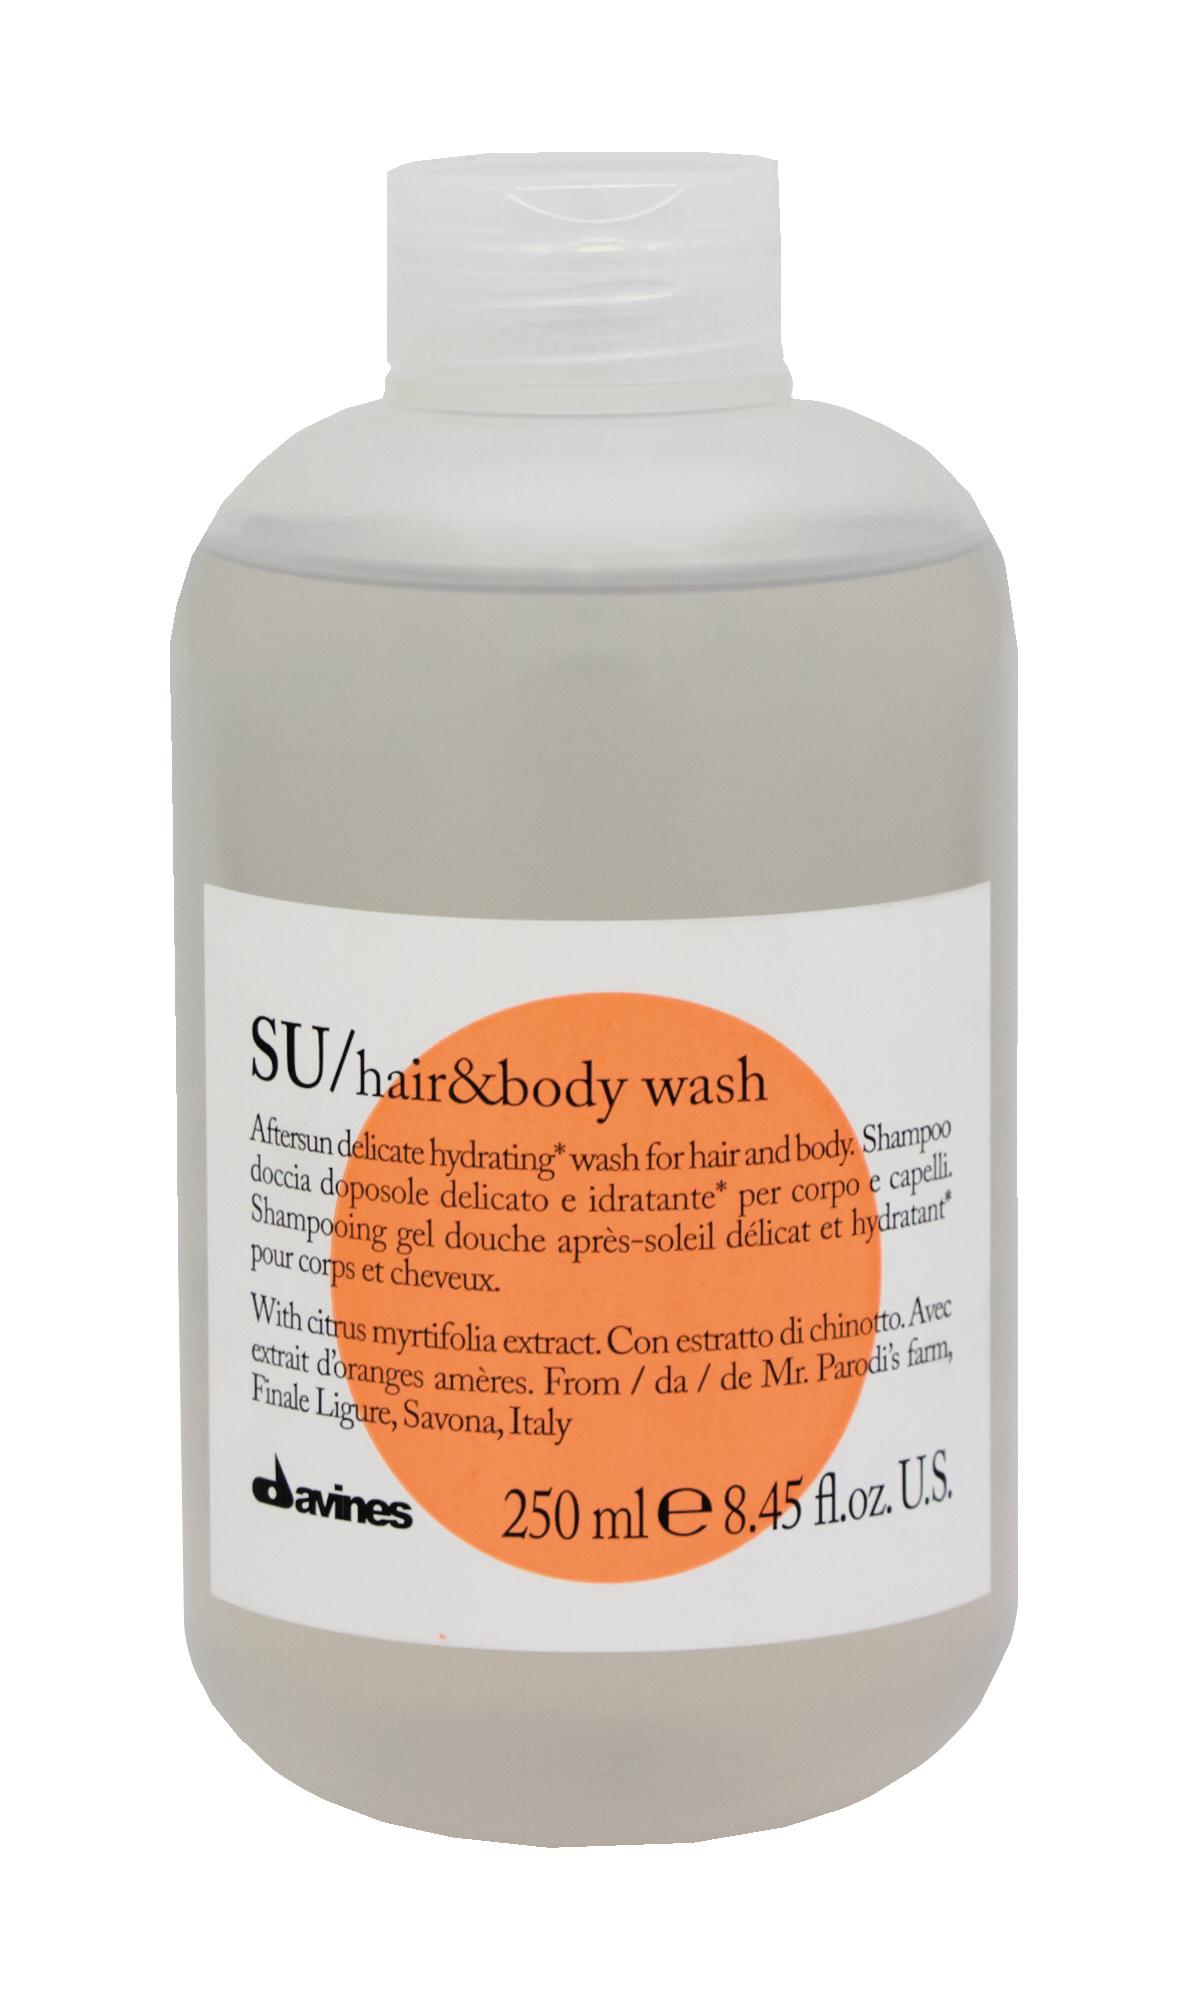 su hair and body wash.jpg